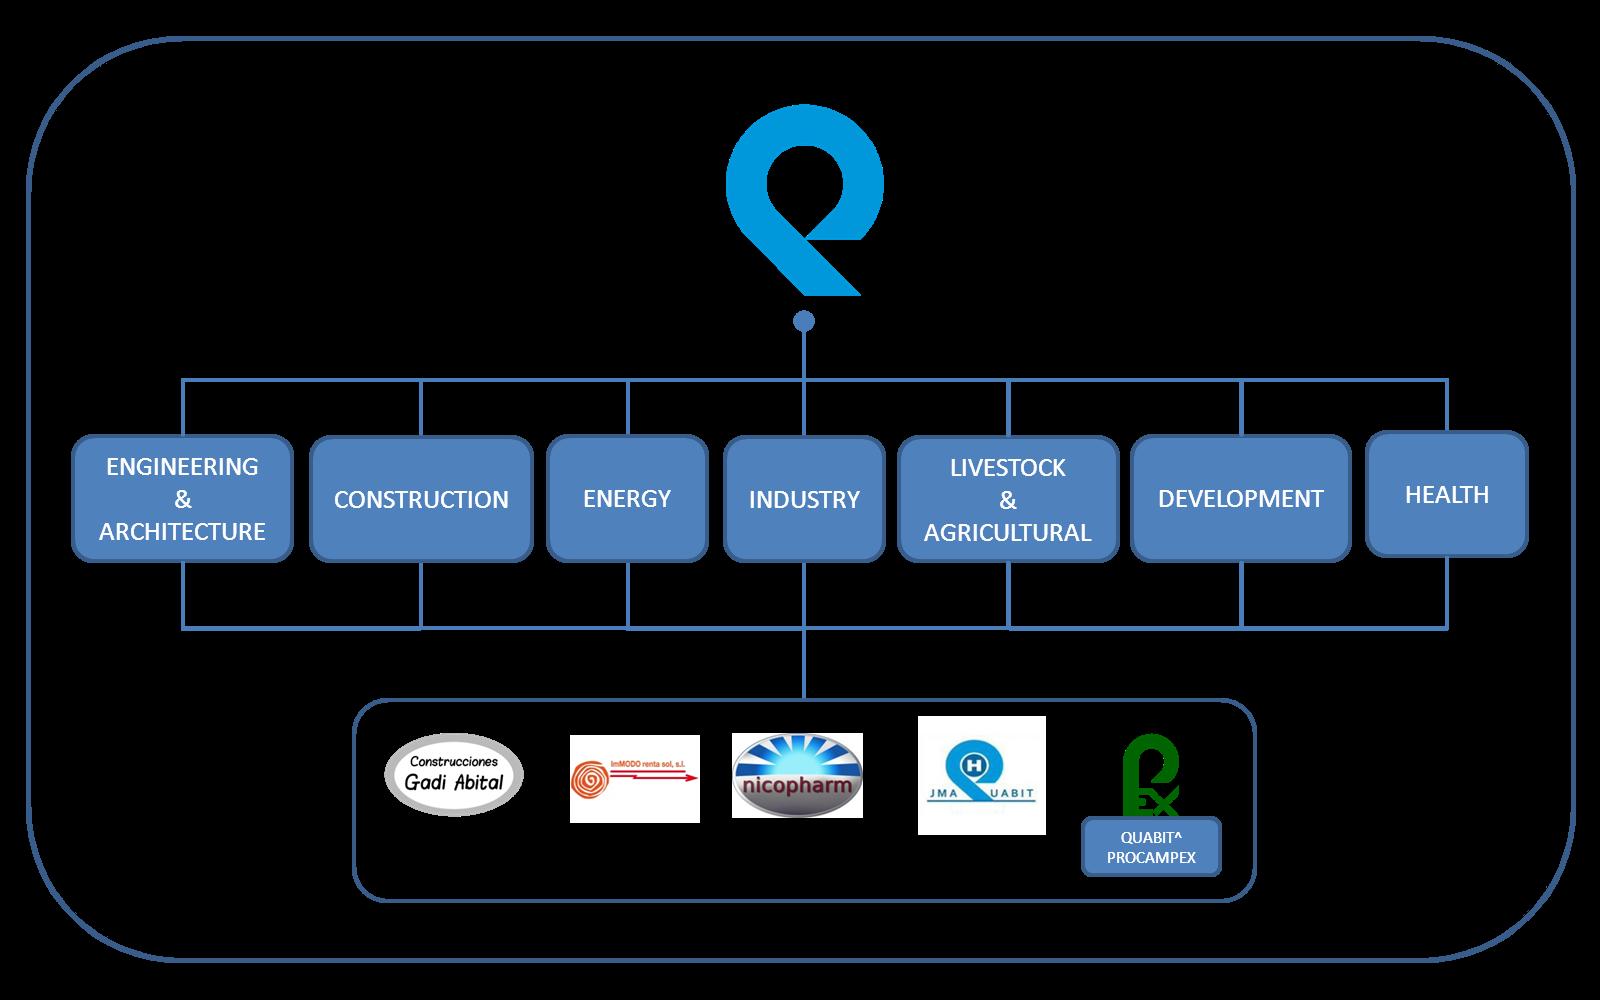 Organizational chart of the Company